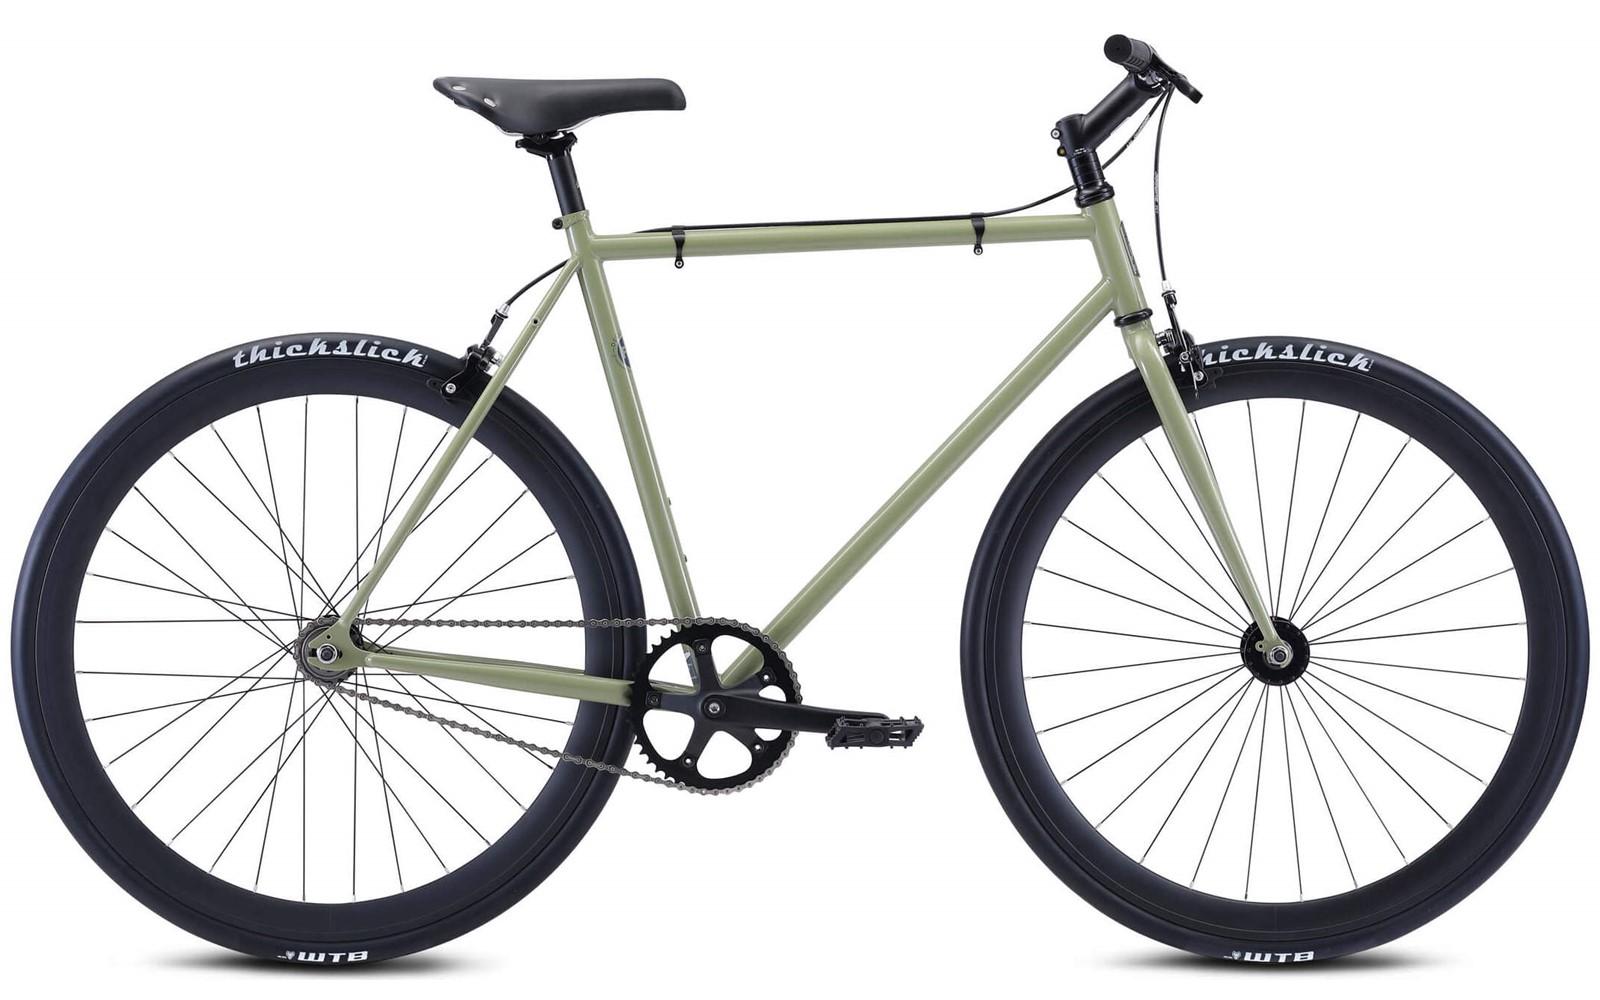 Велосипед Fuji Declaration Khaki Green за 11299900 руб.